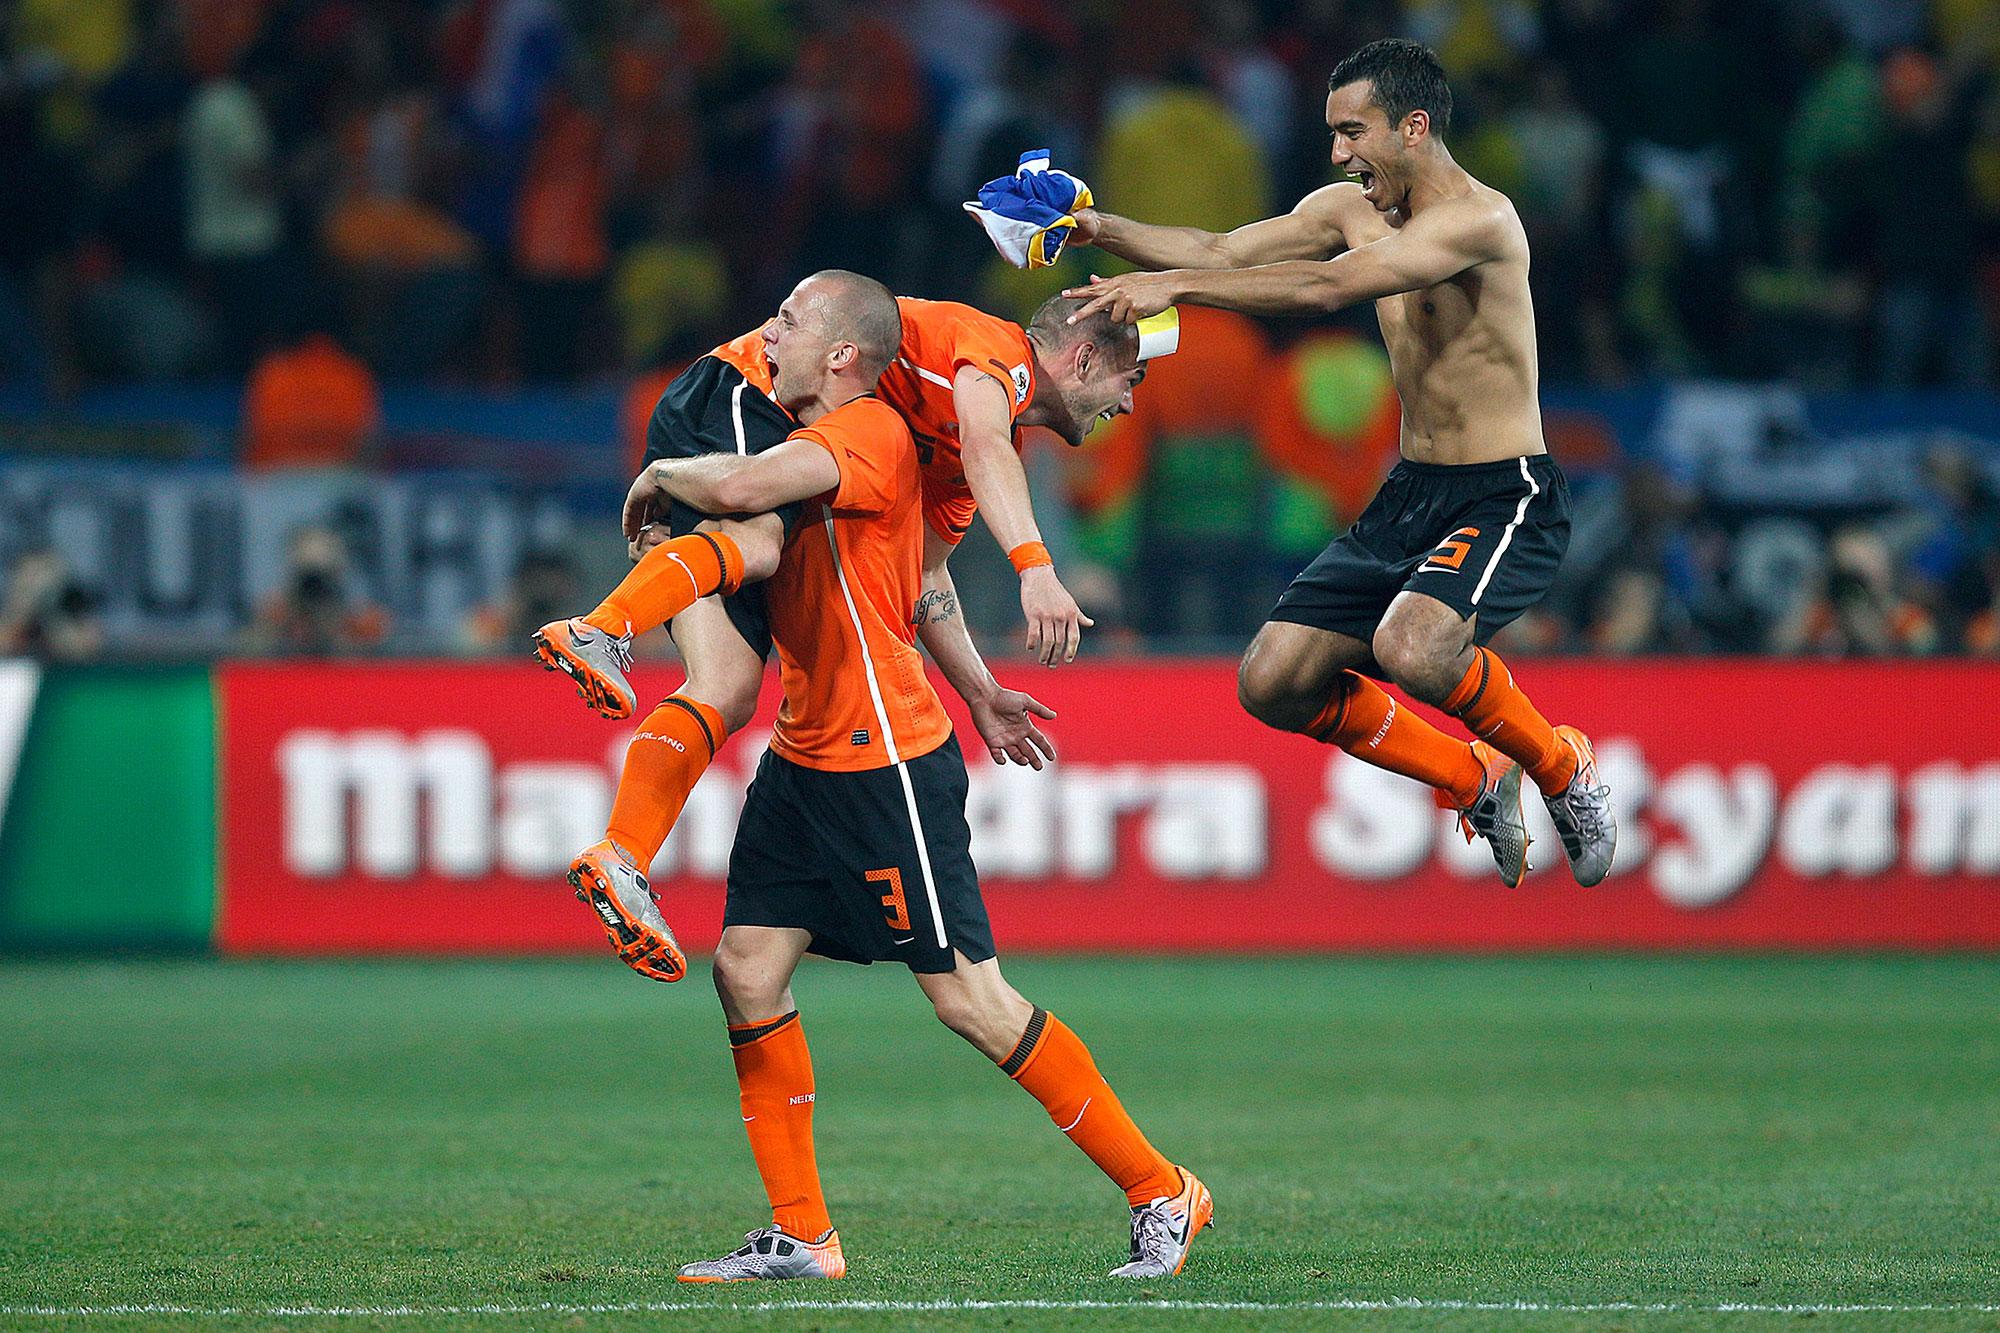 Voetballers na goal